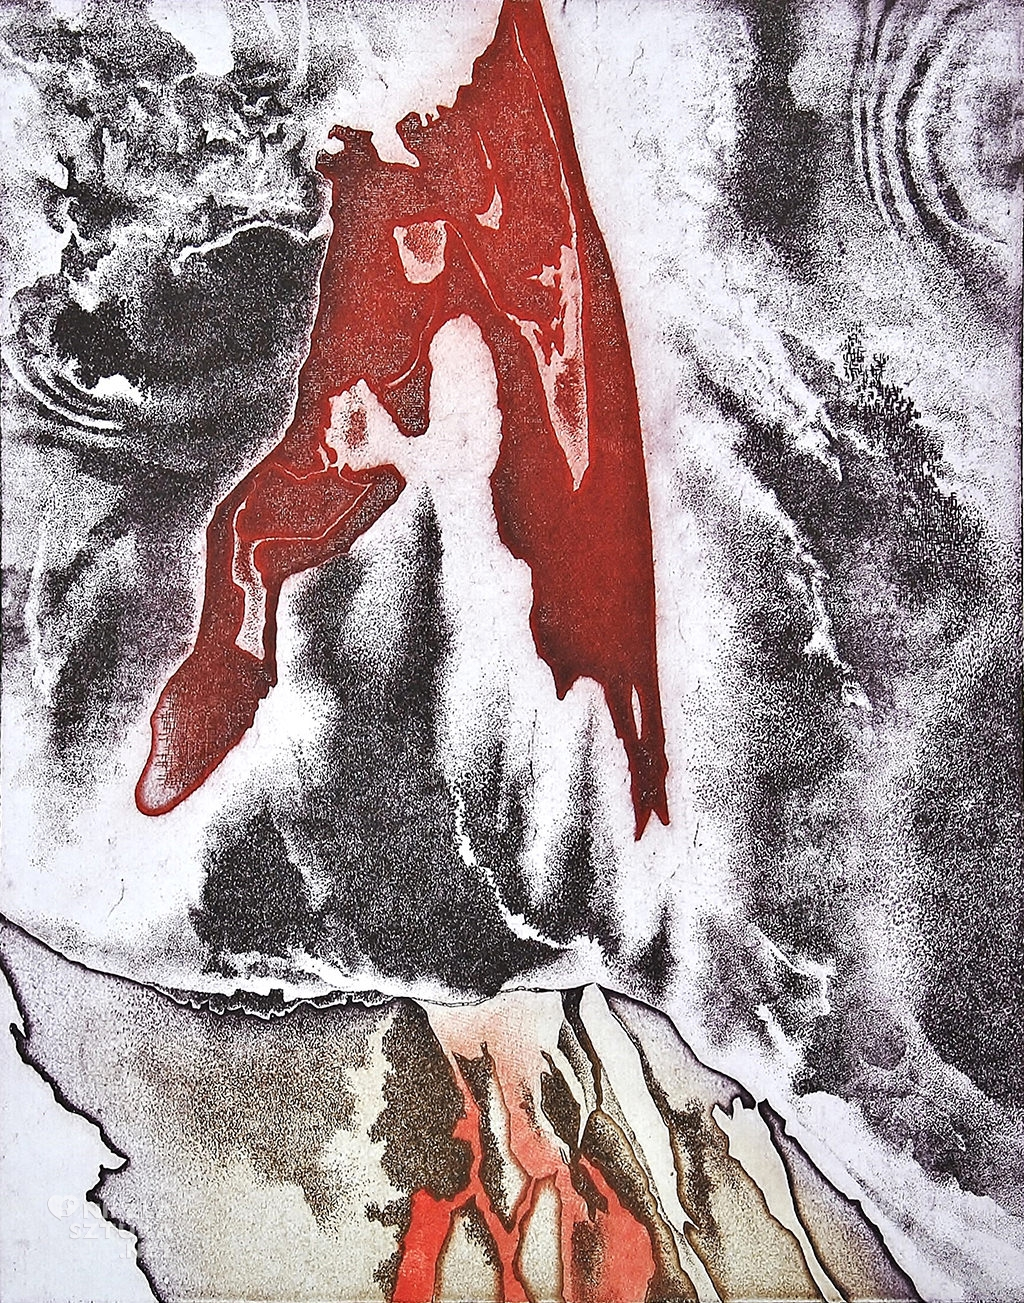 Lenka Vojtova, artystka czeska, rysunek, malarstwo, Niezła sztuka